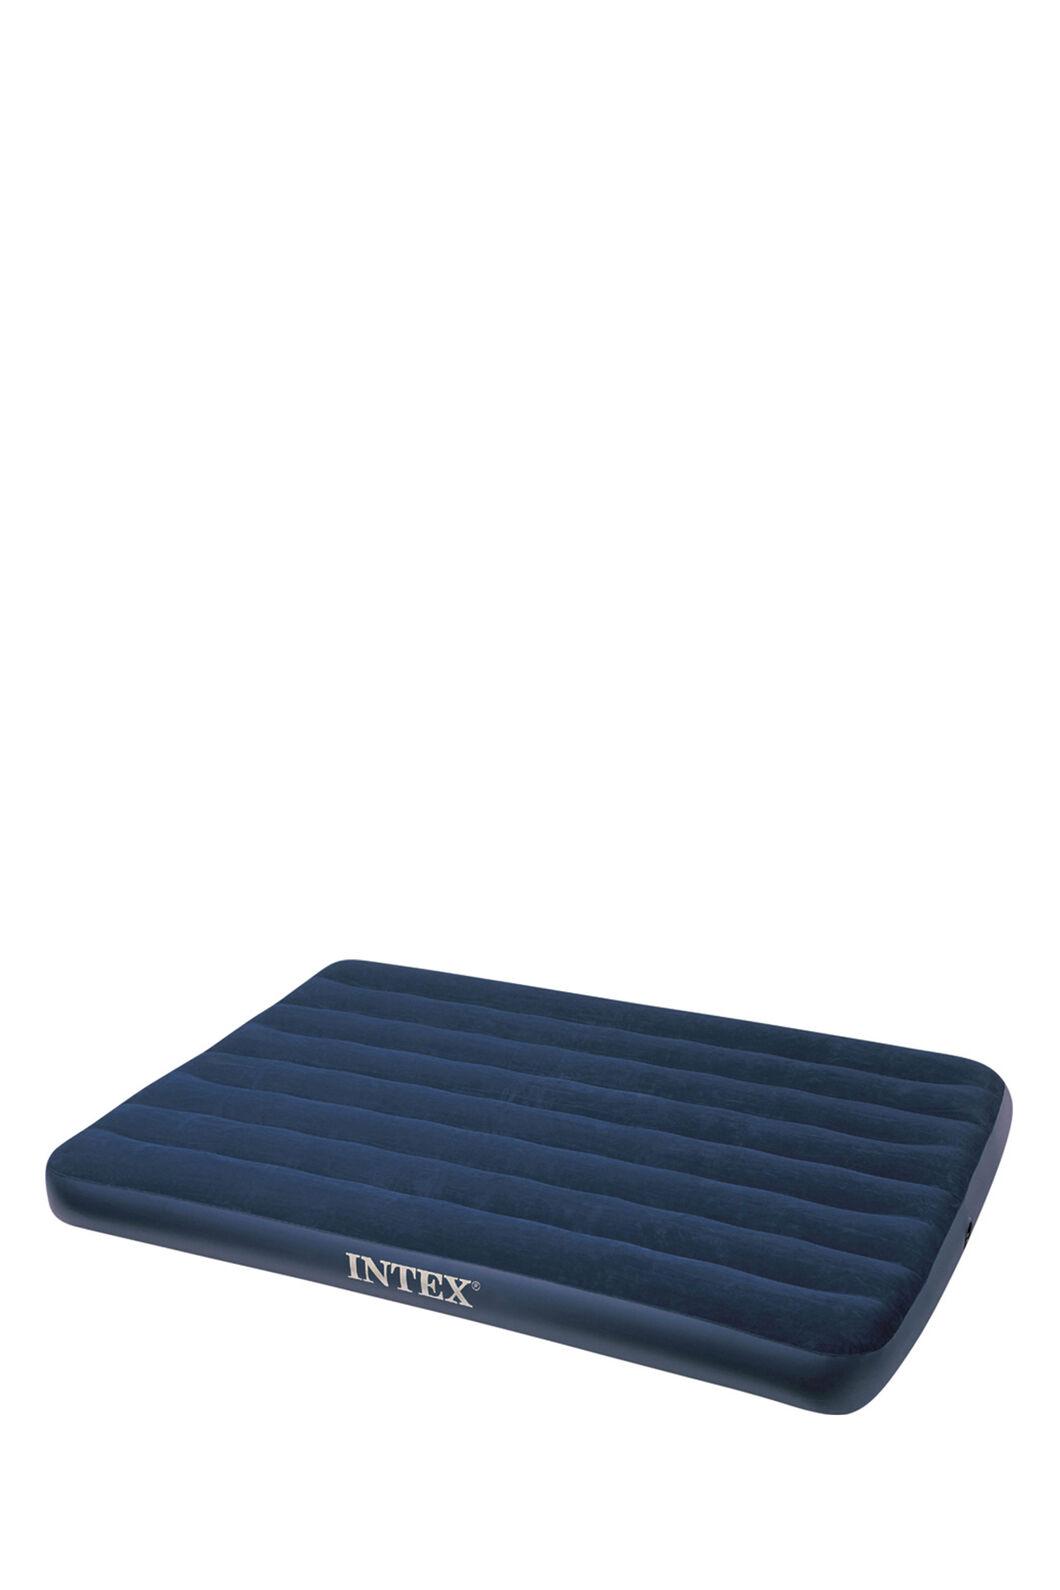 Intex Double Downy Air Bed, None, hi-res